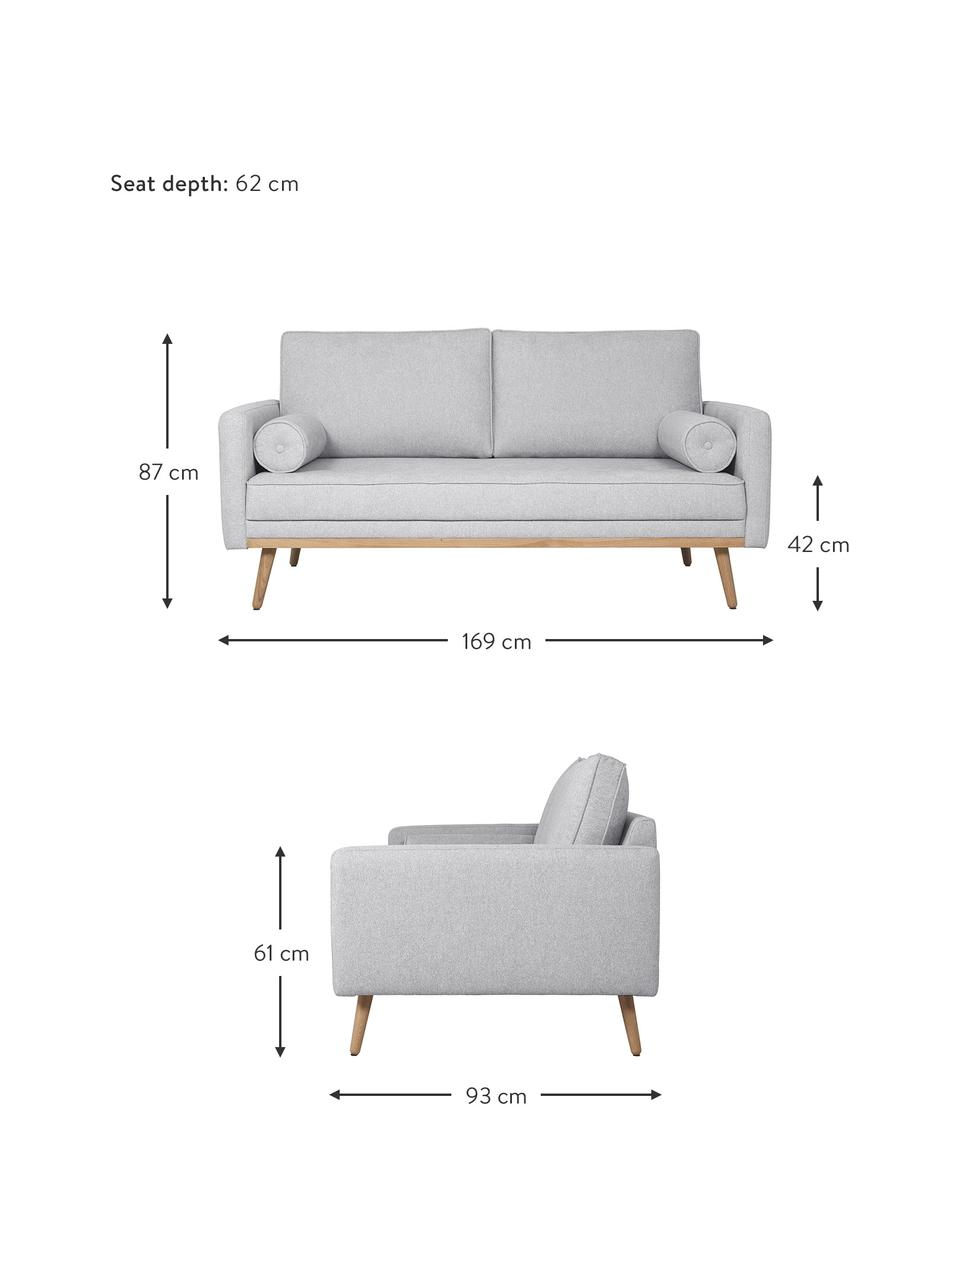 Sofa Saint (2-Sitzer) in Hellgrau mit Eichenholz-Füßen, Bezug: Polyester Der hochwertige, Gestell: Massives Kiefernholz, Spa, Webstoff Hellgrau, B 169 x T 87 cm